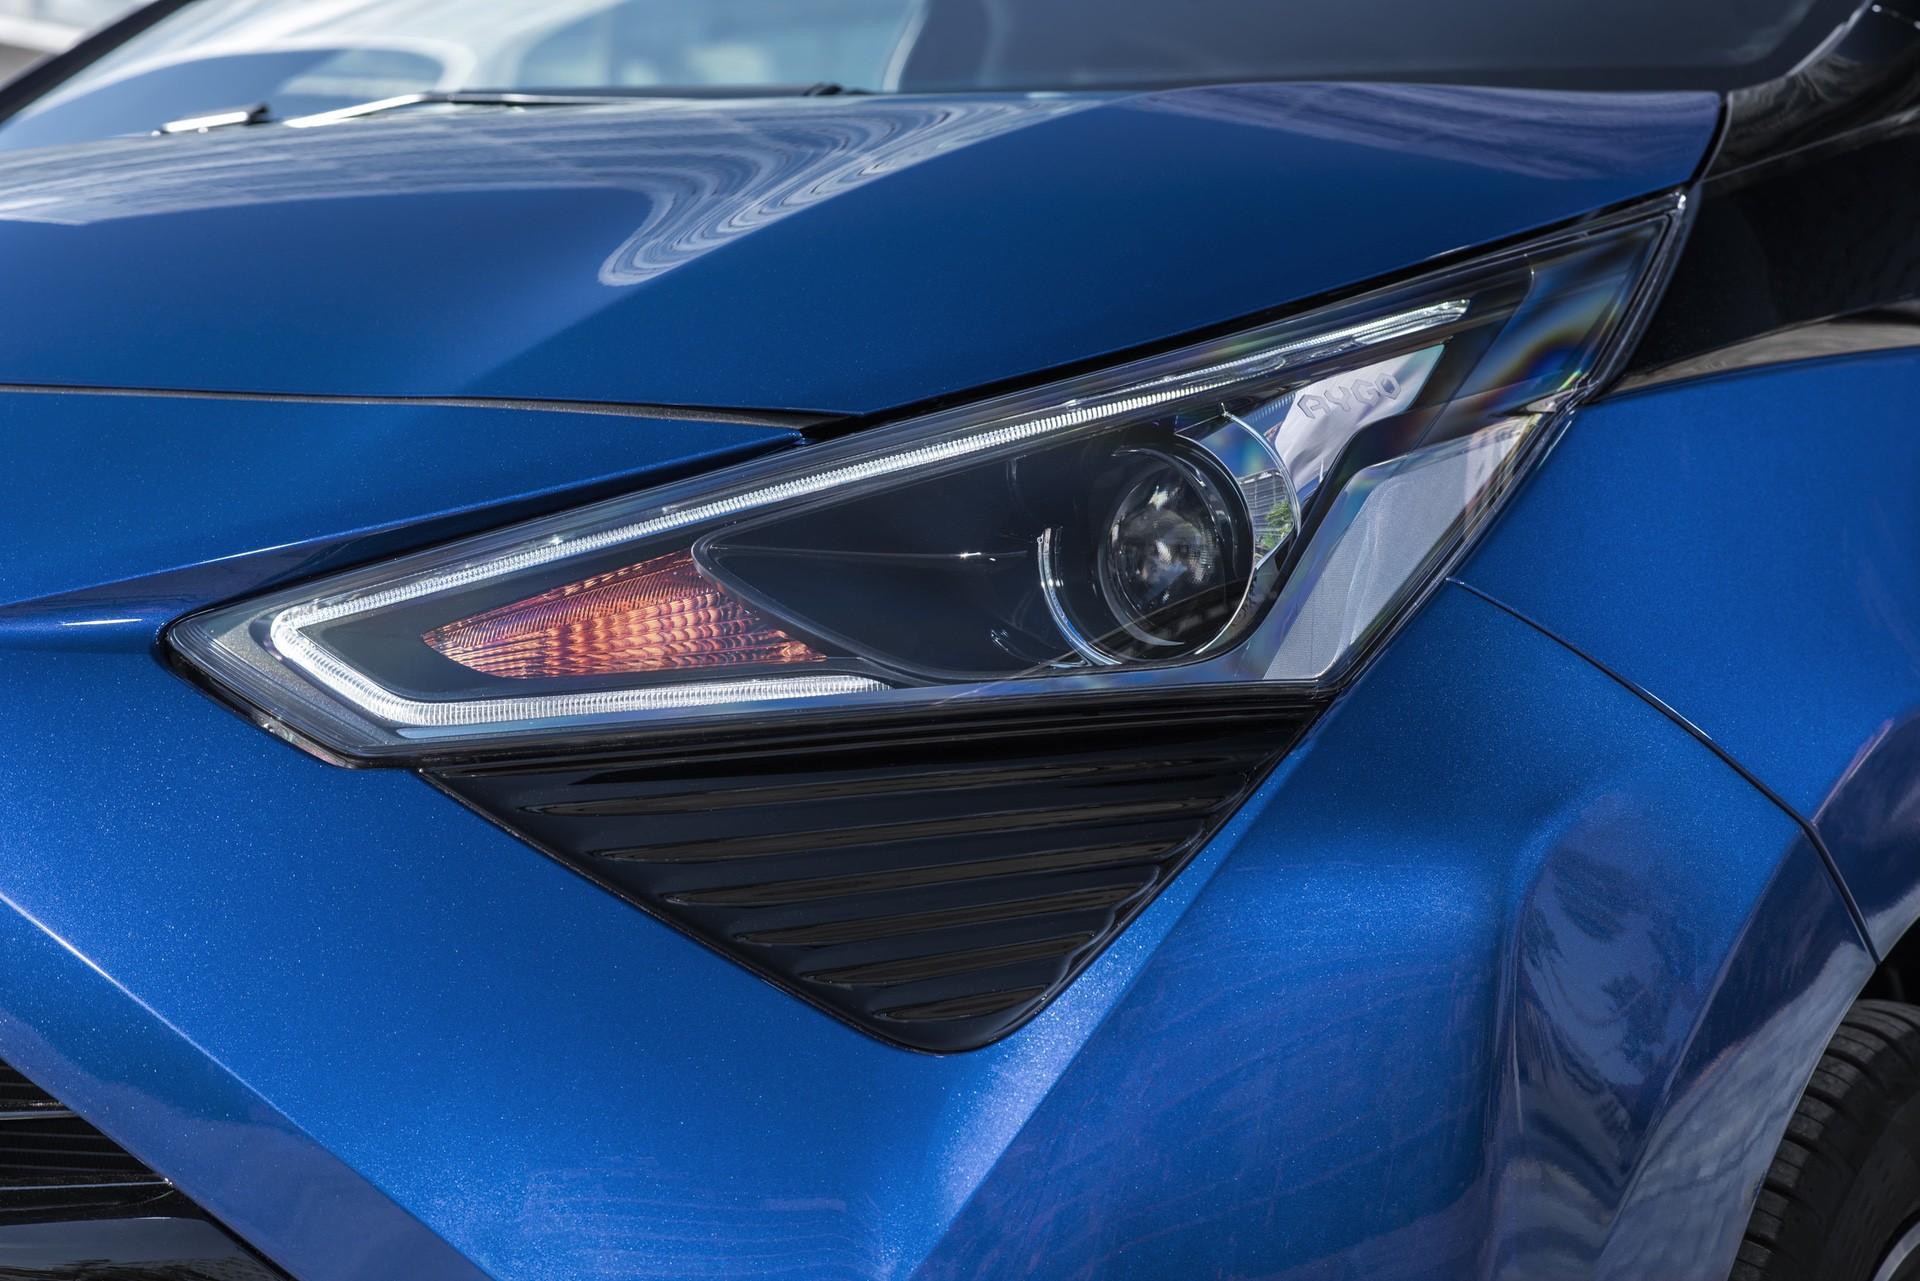 Toyota_Aygo_facelift_presskit_0026